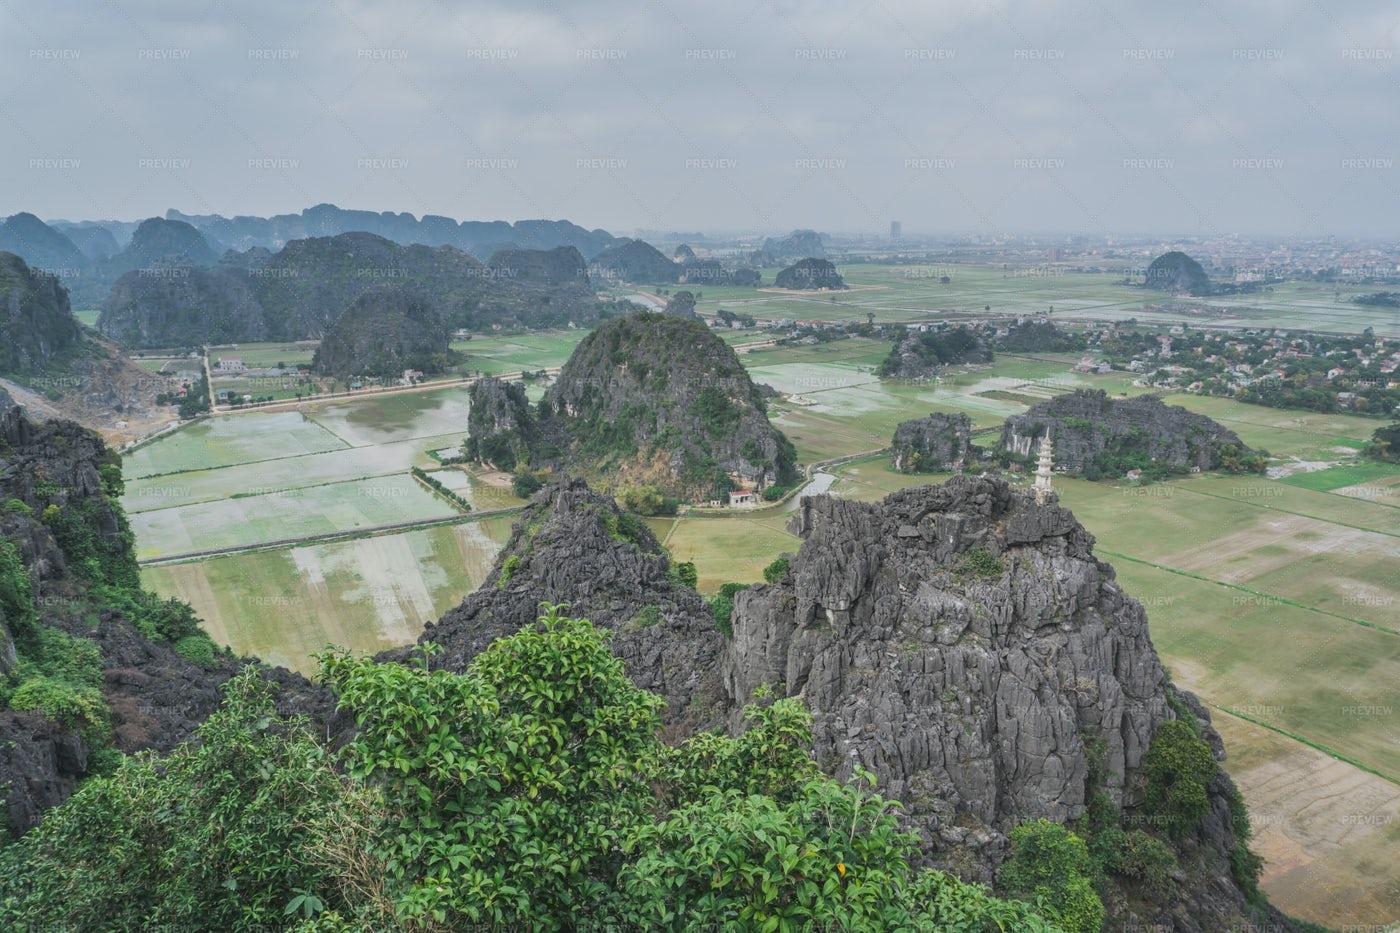 Mua Caves Landscape In Ninh Binh: Stock Photos